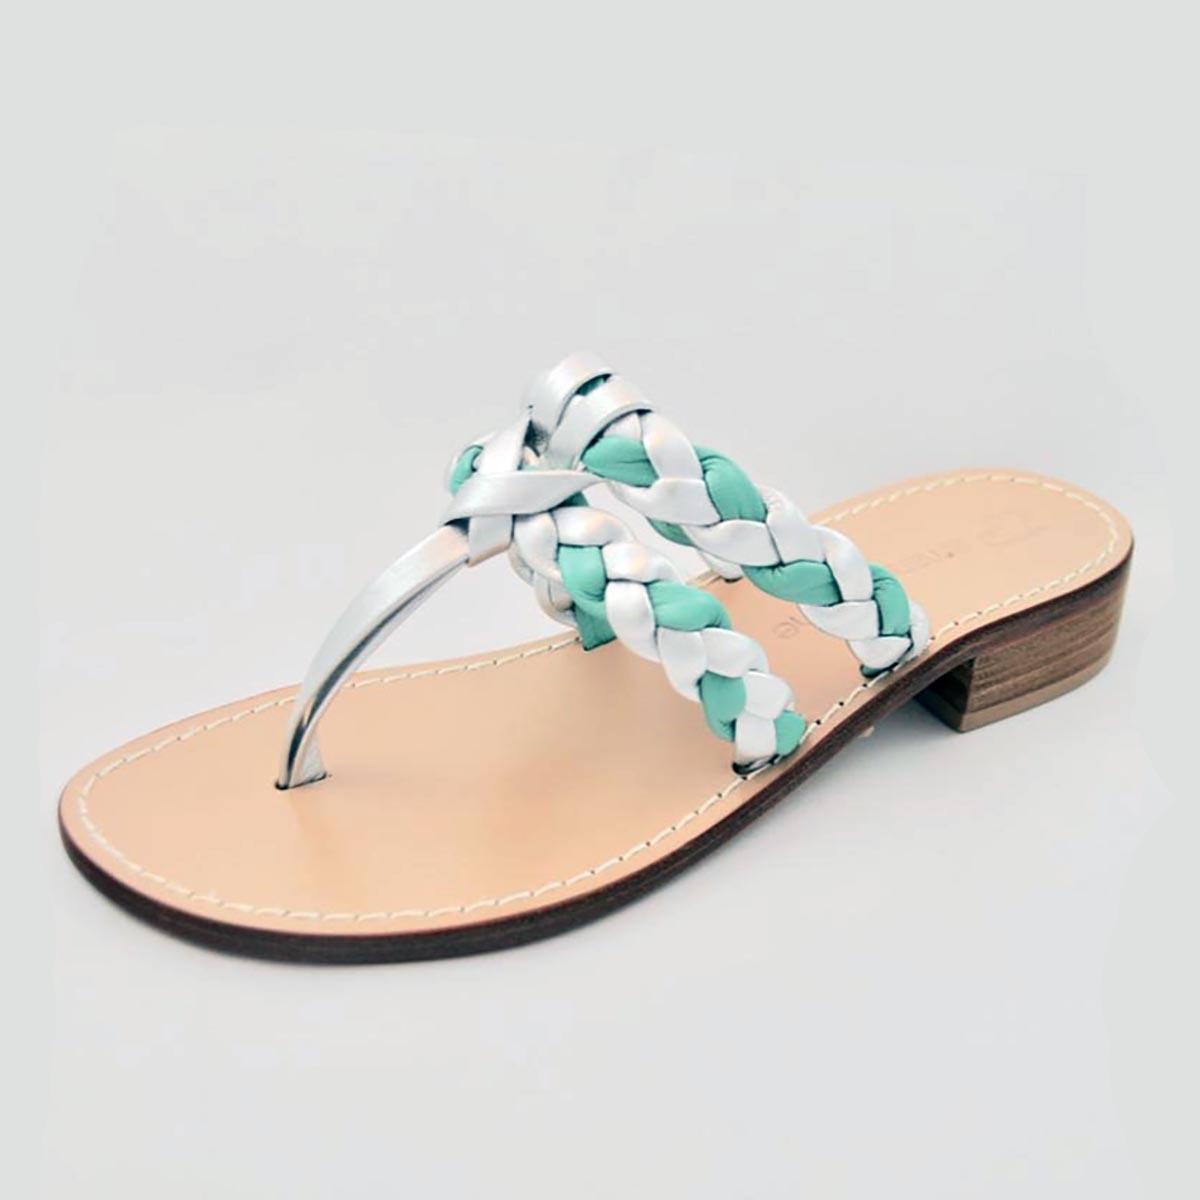 Amanda Jayne - Positano Summer Sandal